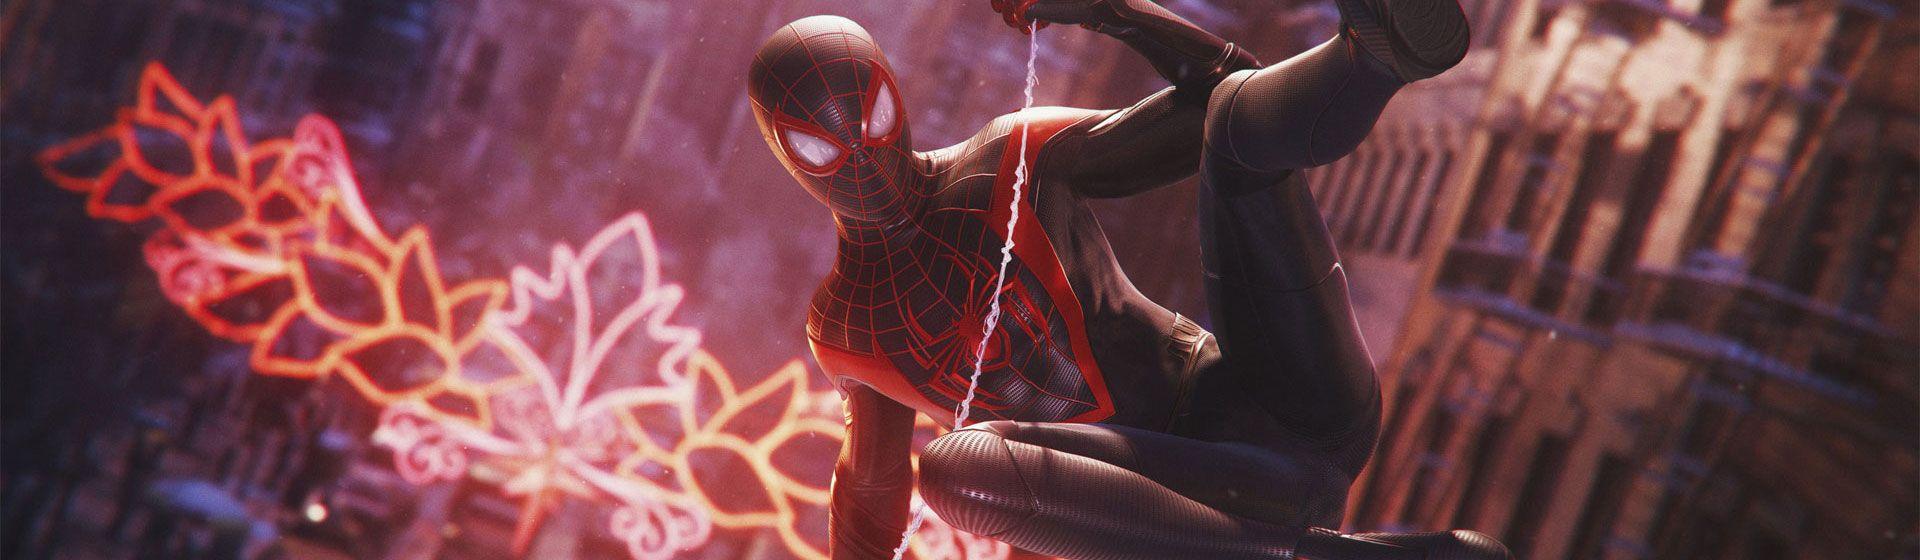 Spider-Man Miles Morales recebe trailer de lançamento; assista